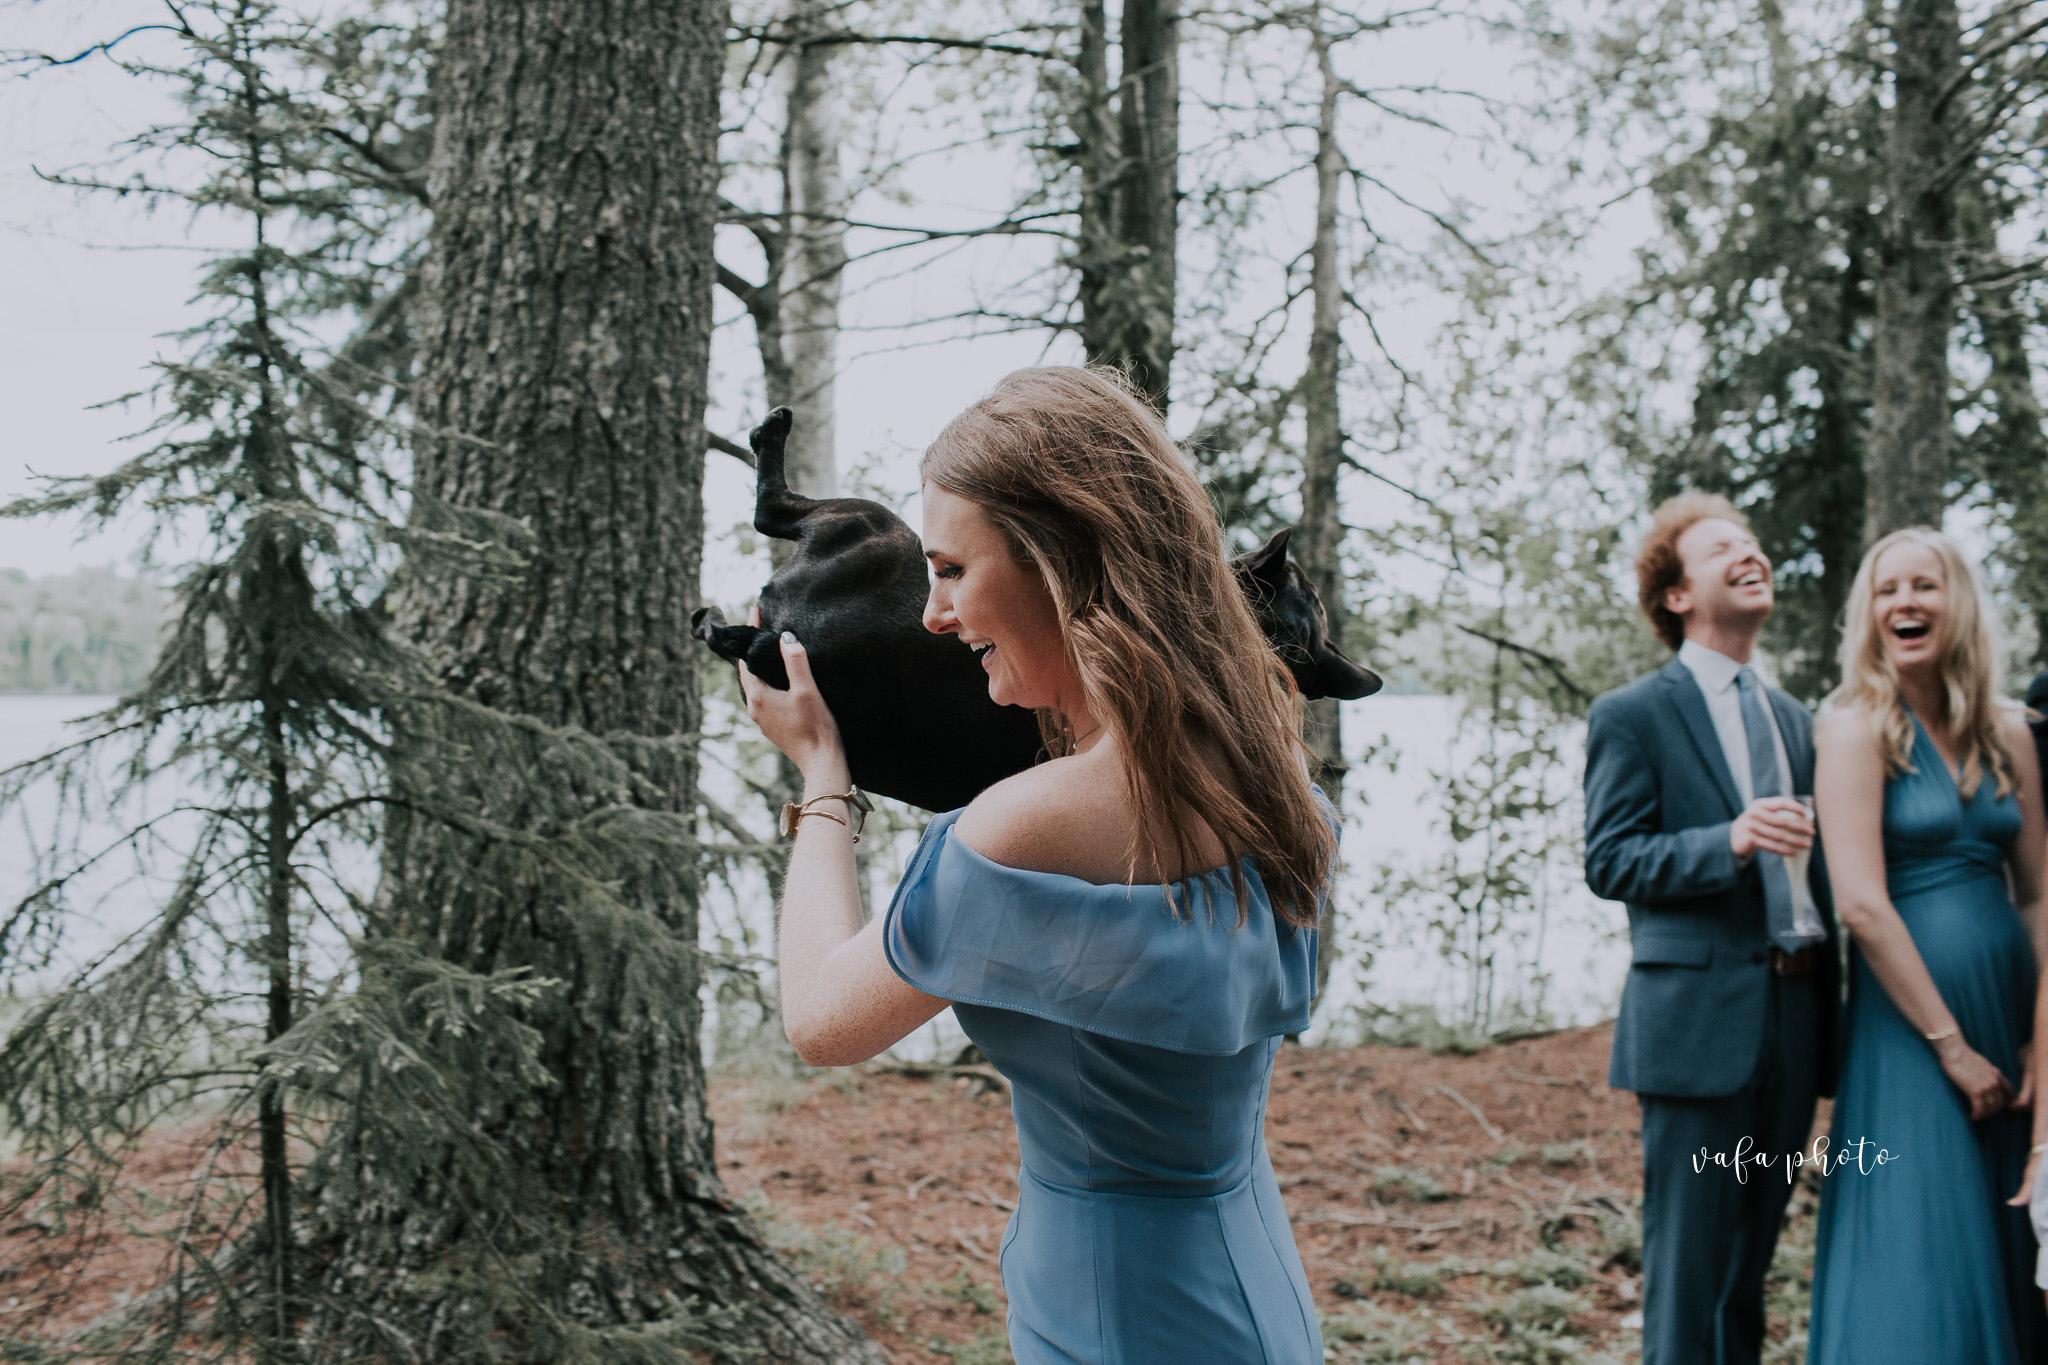 Michigan-Lake-House-Wedding-Madeline-Patrick-Vafa-Photo-486.jpg